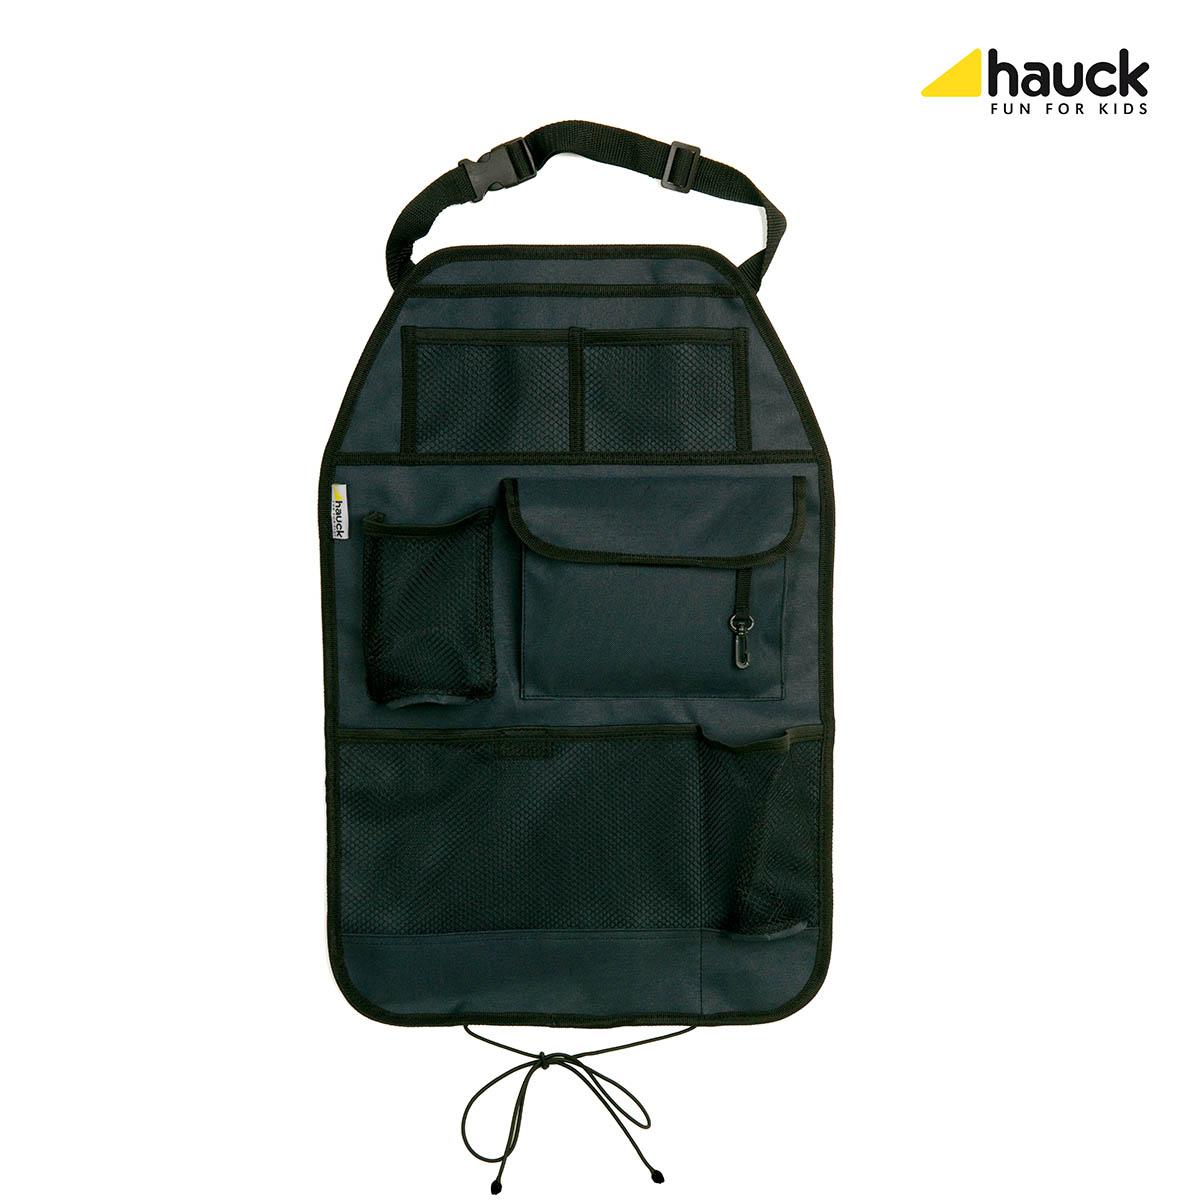 Hauck automašīnas sēdekļa aizsargs - Cover Me Delux